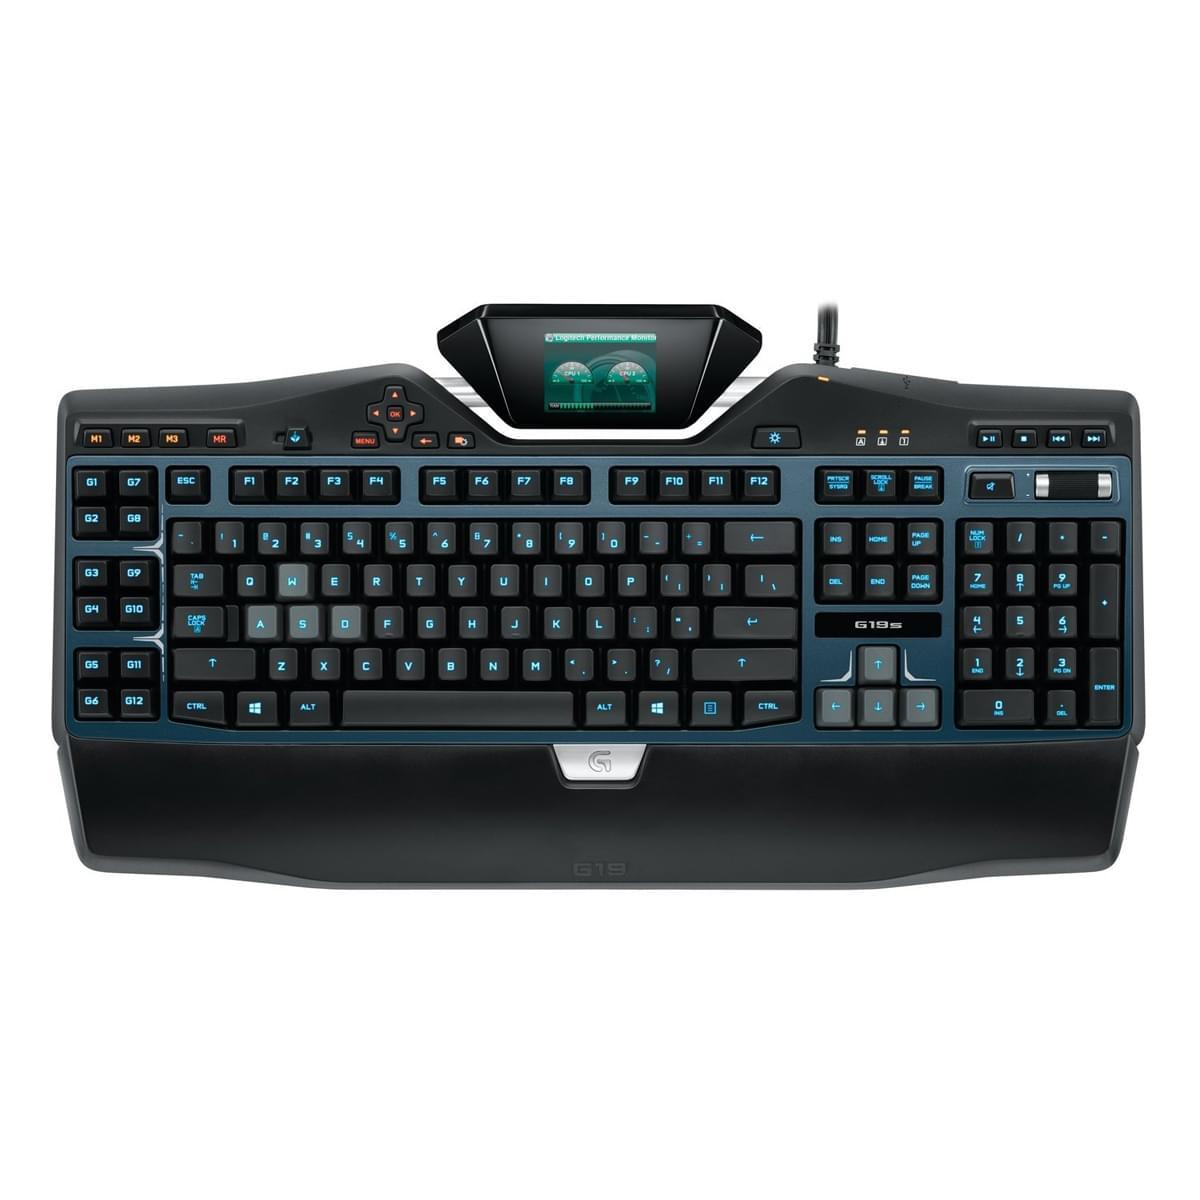 Logitech G G19 S Gaming Keyboard (920-004987 soldé) - Achat / Vente Clavier PC sur Cybertek.fr - 0